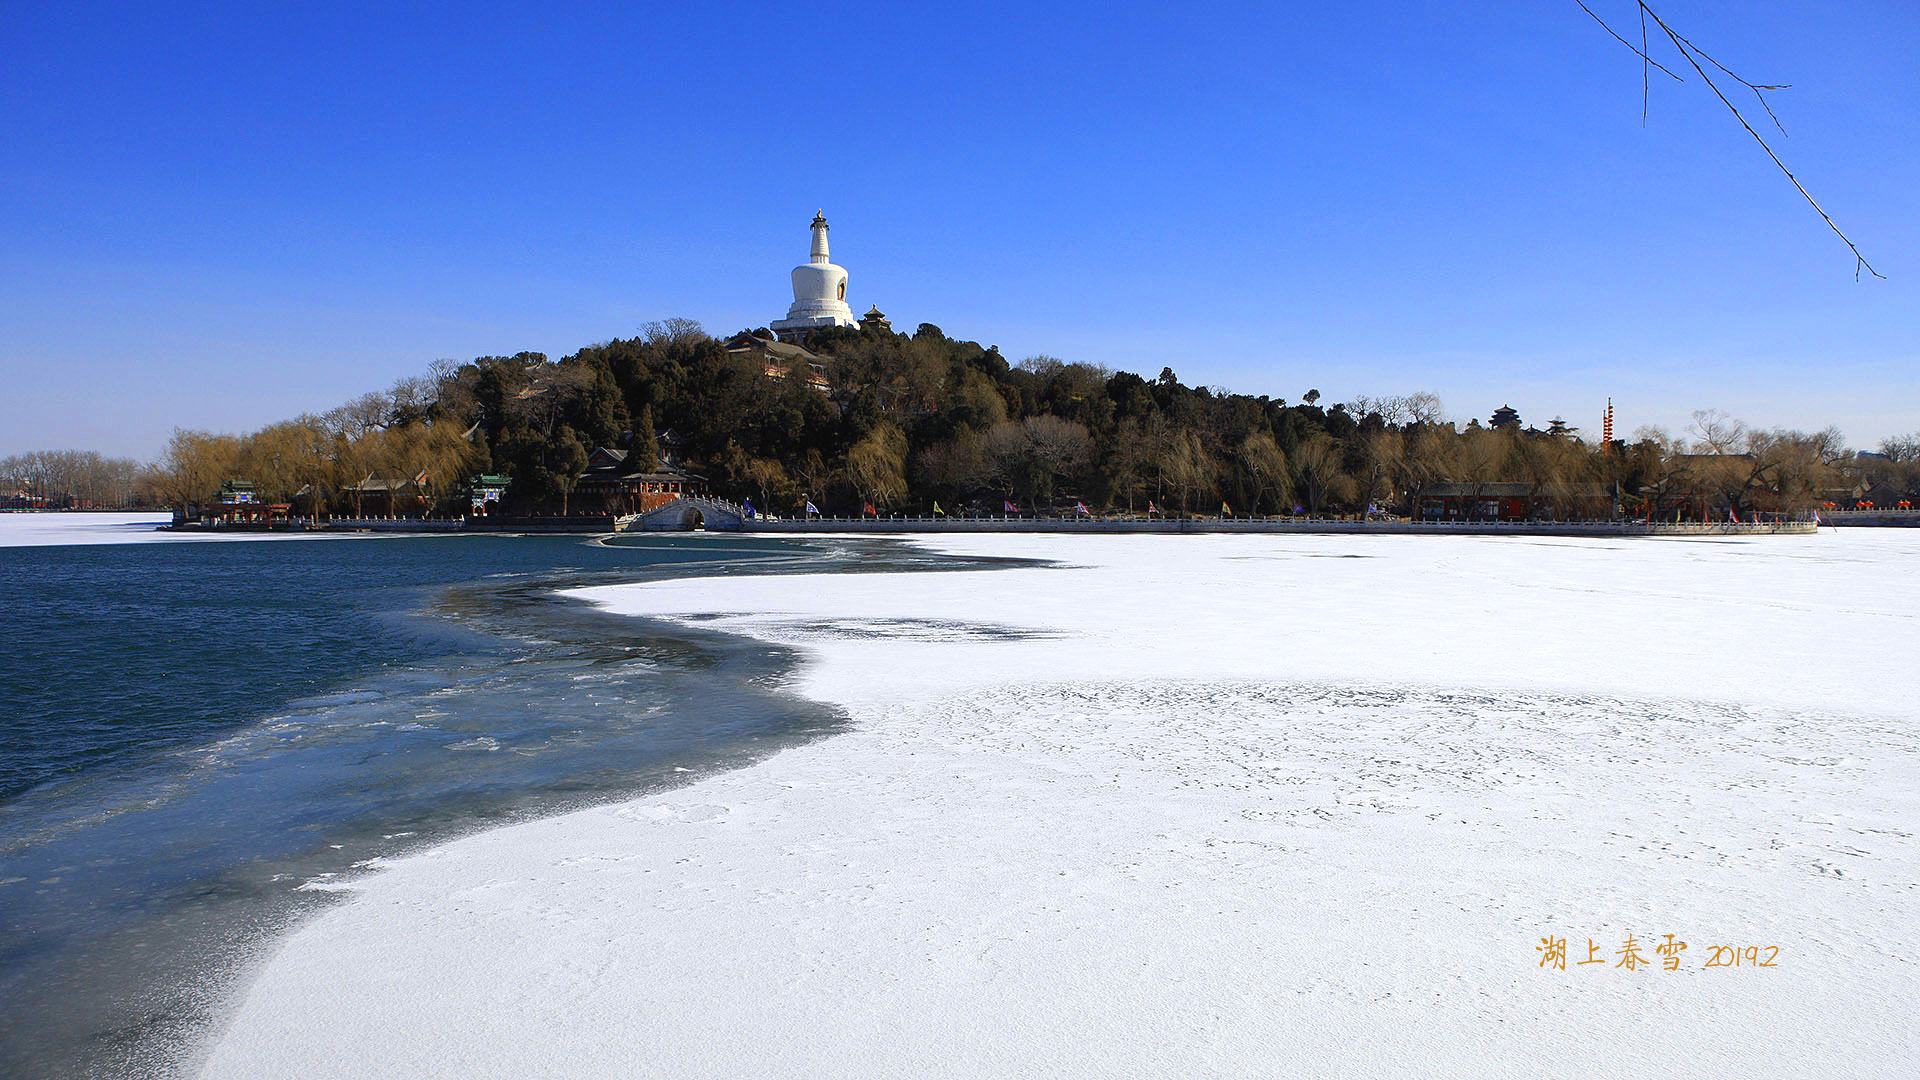 lantian作品:湖上春雪